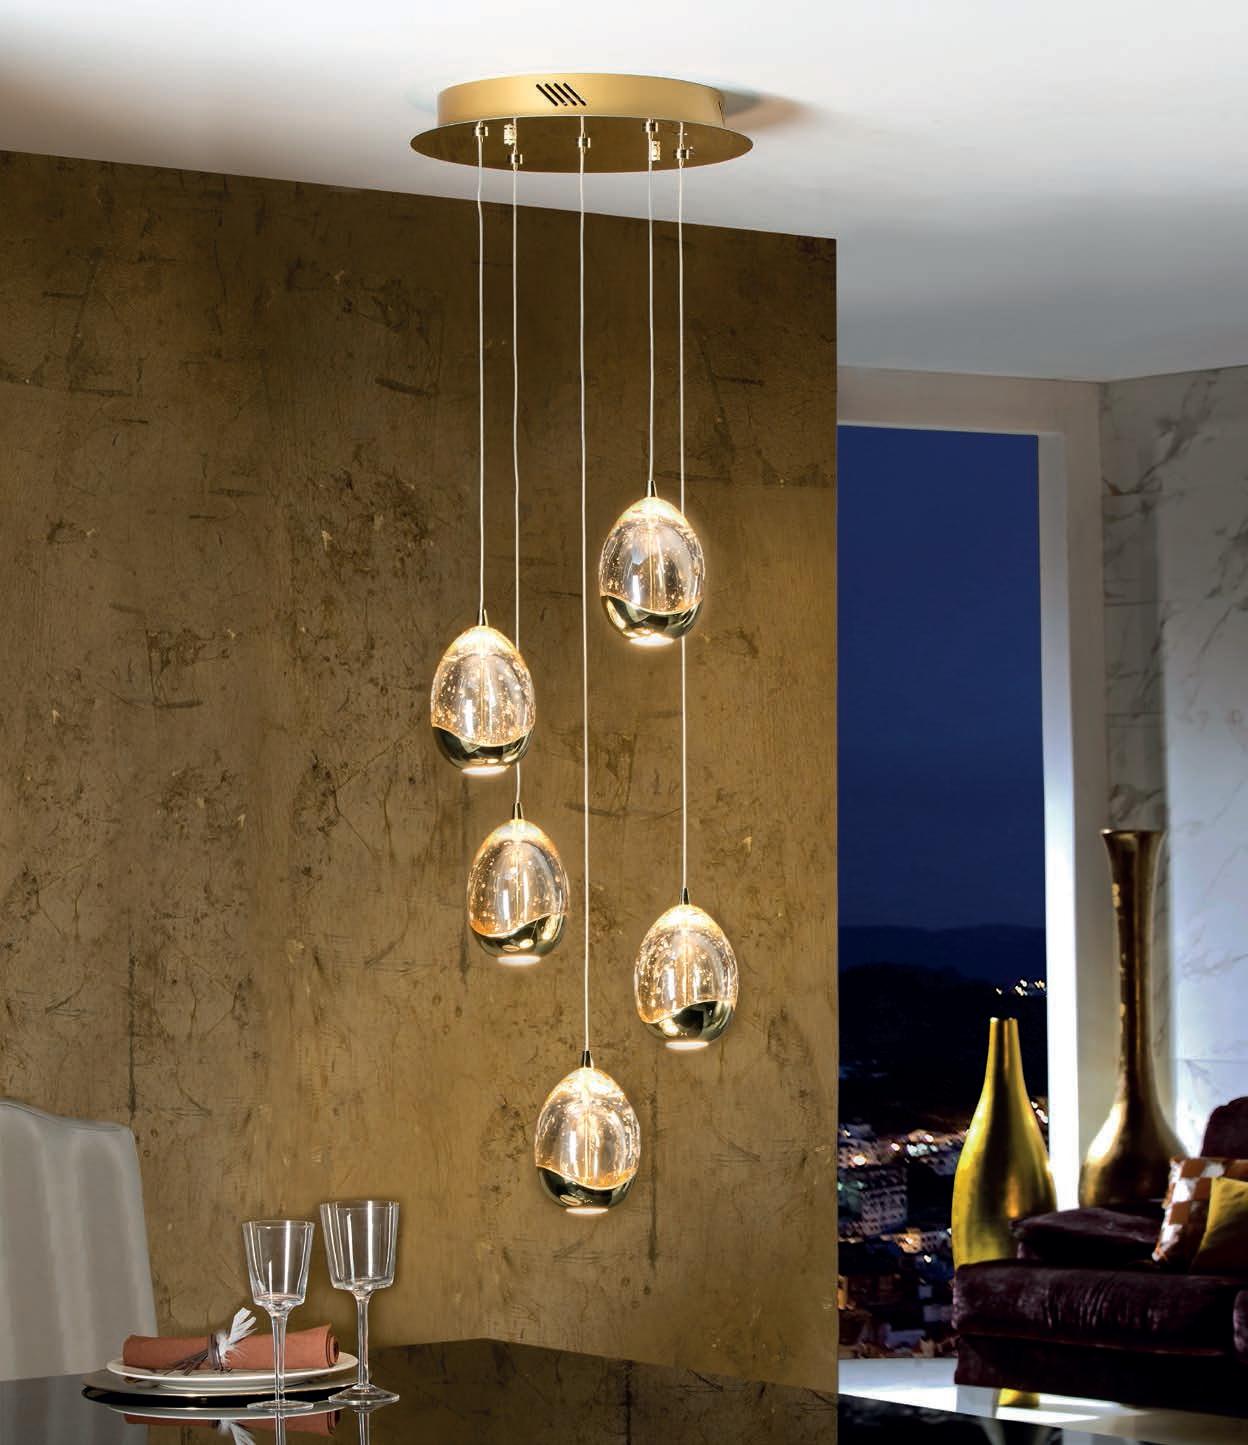 led pendant 5 light pendant chrome or gold. Black Bedroom Furniture Sets. Home Design Ideas